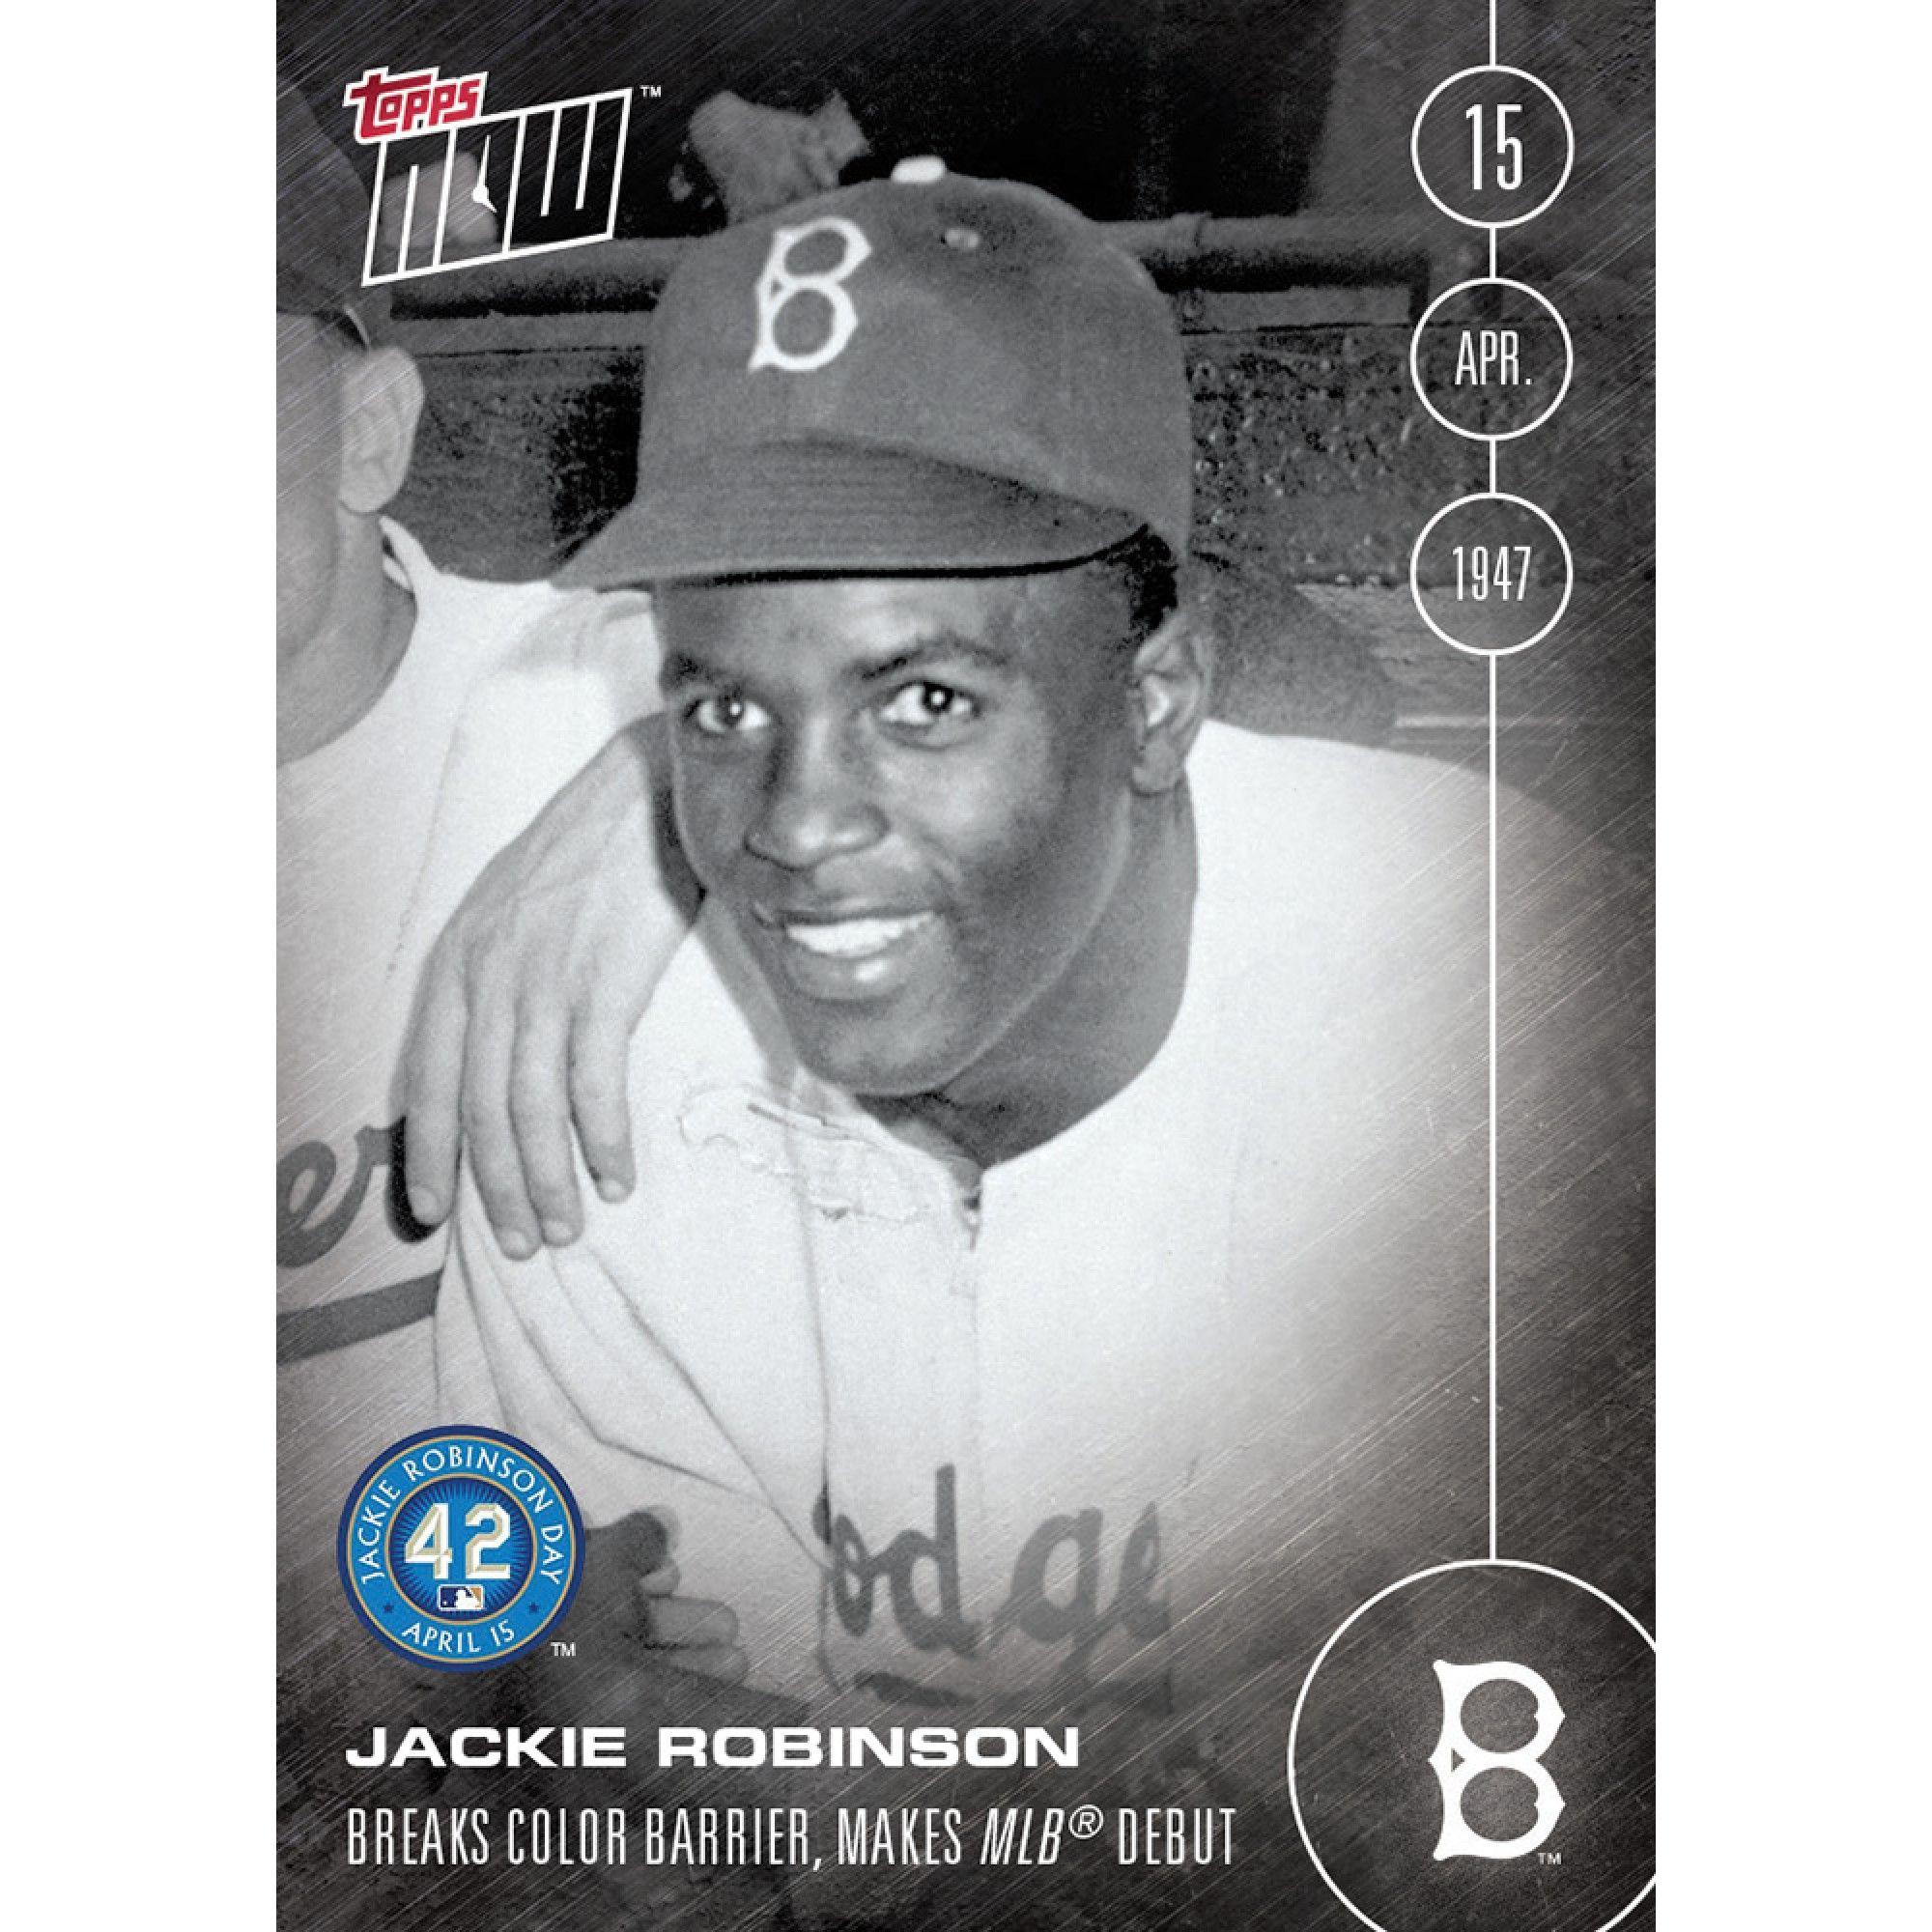 Jackie robinson 41516 topps now card 21 print run